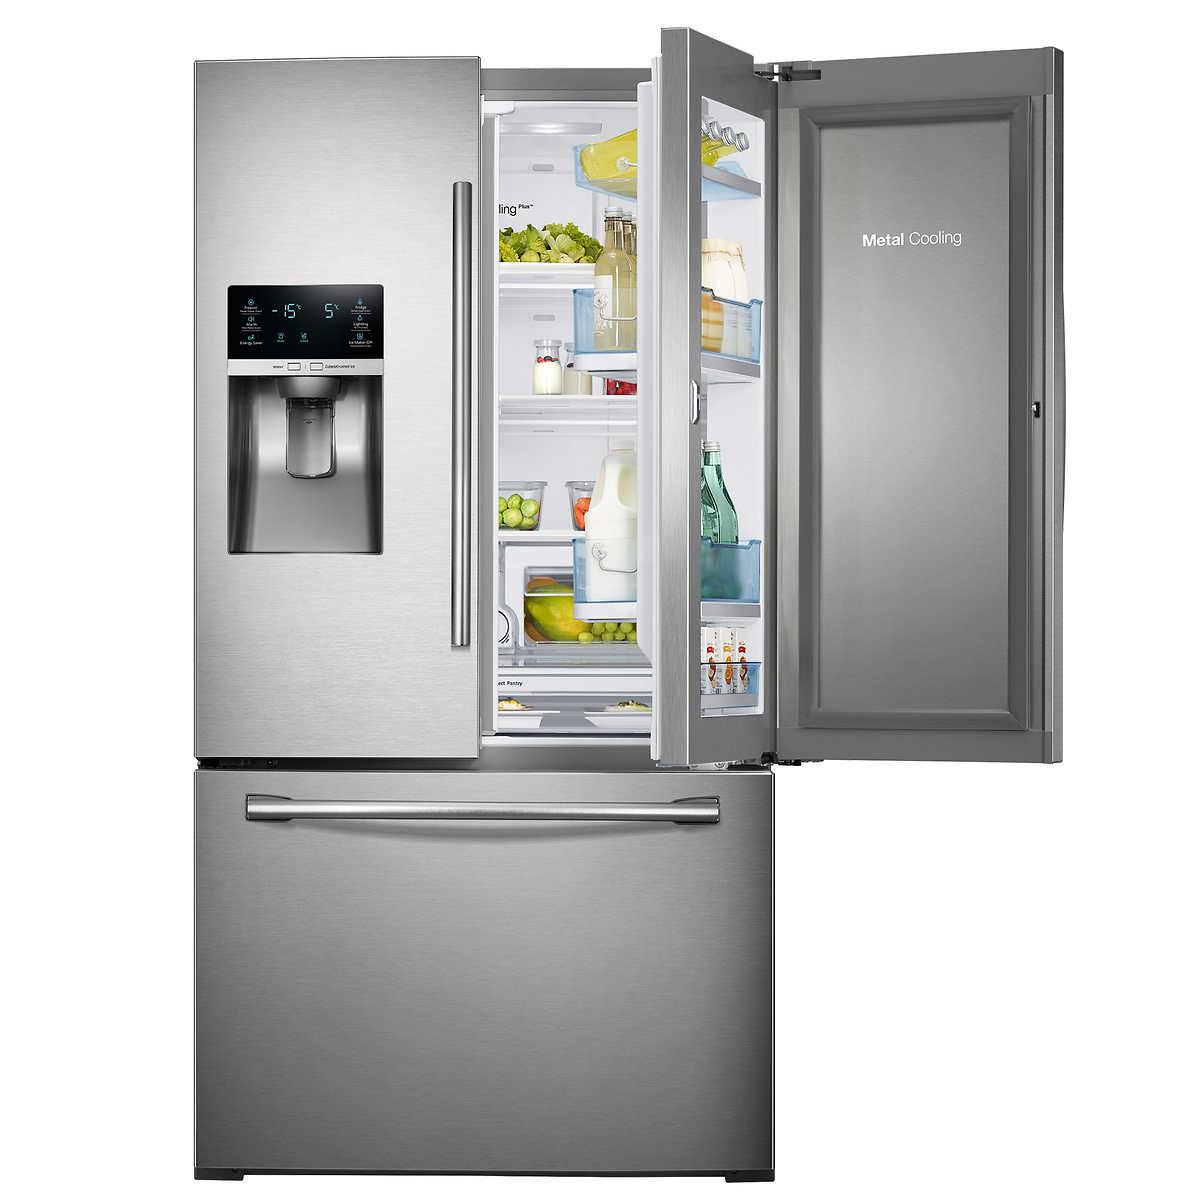 Samsung 28cuft 3 door french door showcase refrigerator with metal 1 1 rubansaba